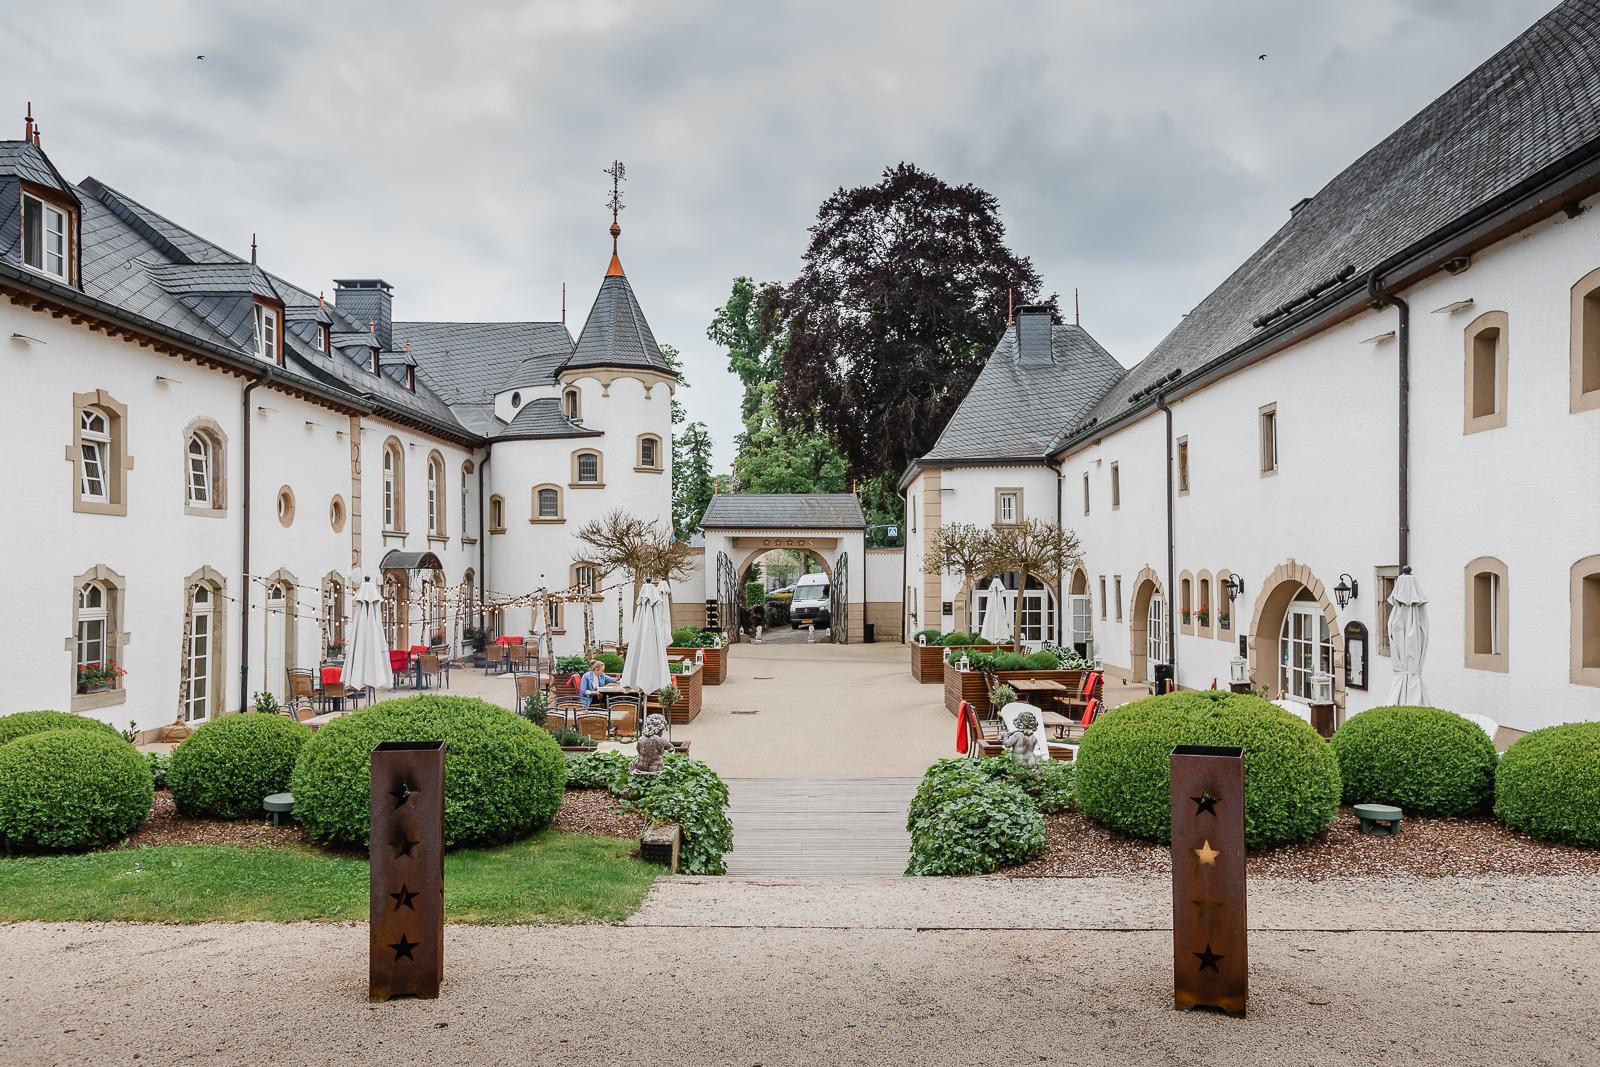 Chateau d'Urspelt courtyard